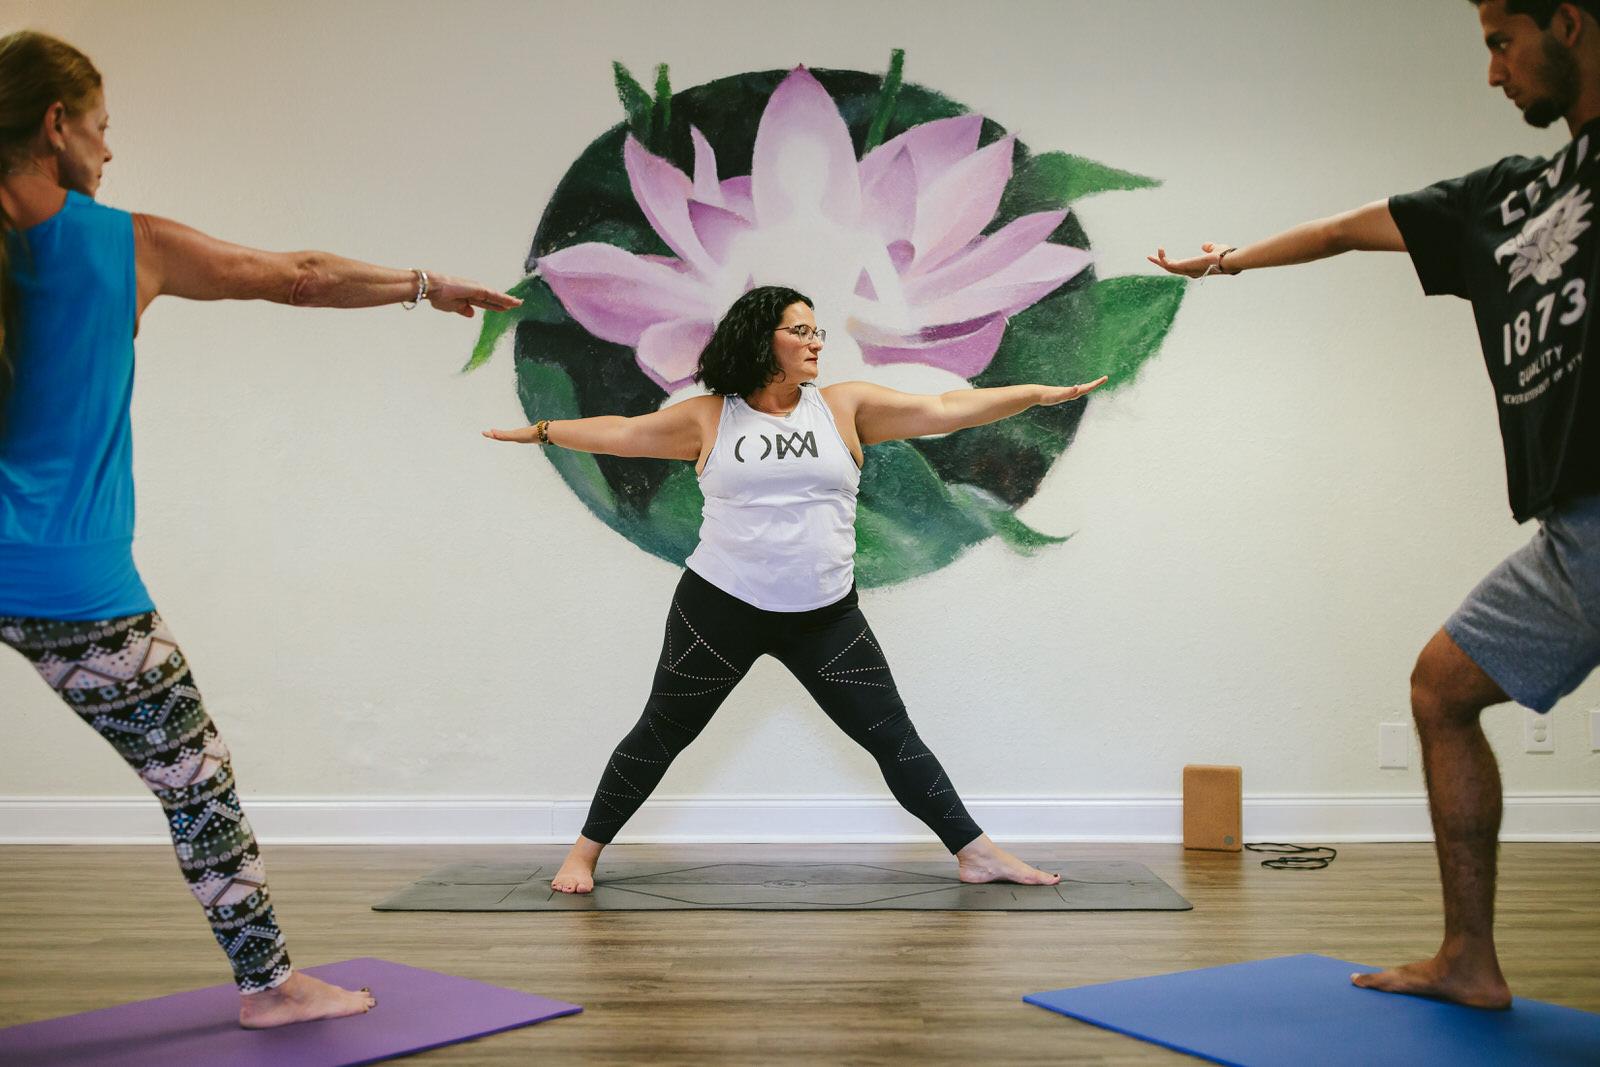 Tamar-Prana-Lab-Body-Work-Yoga-Class-31.jpg